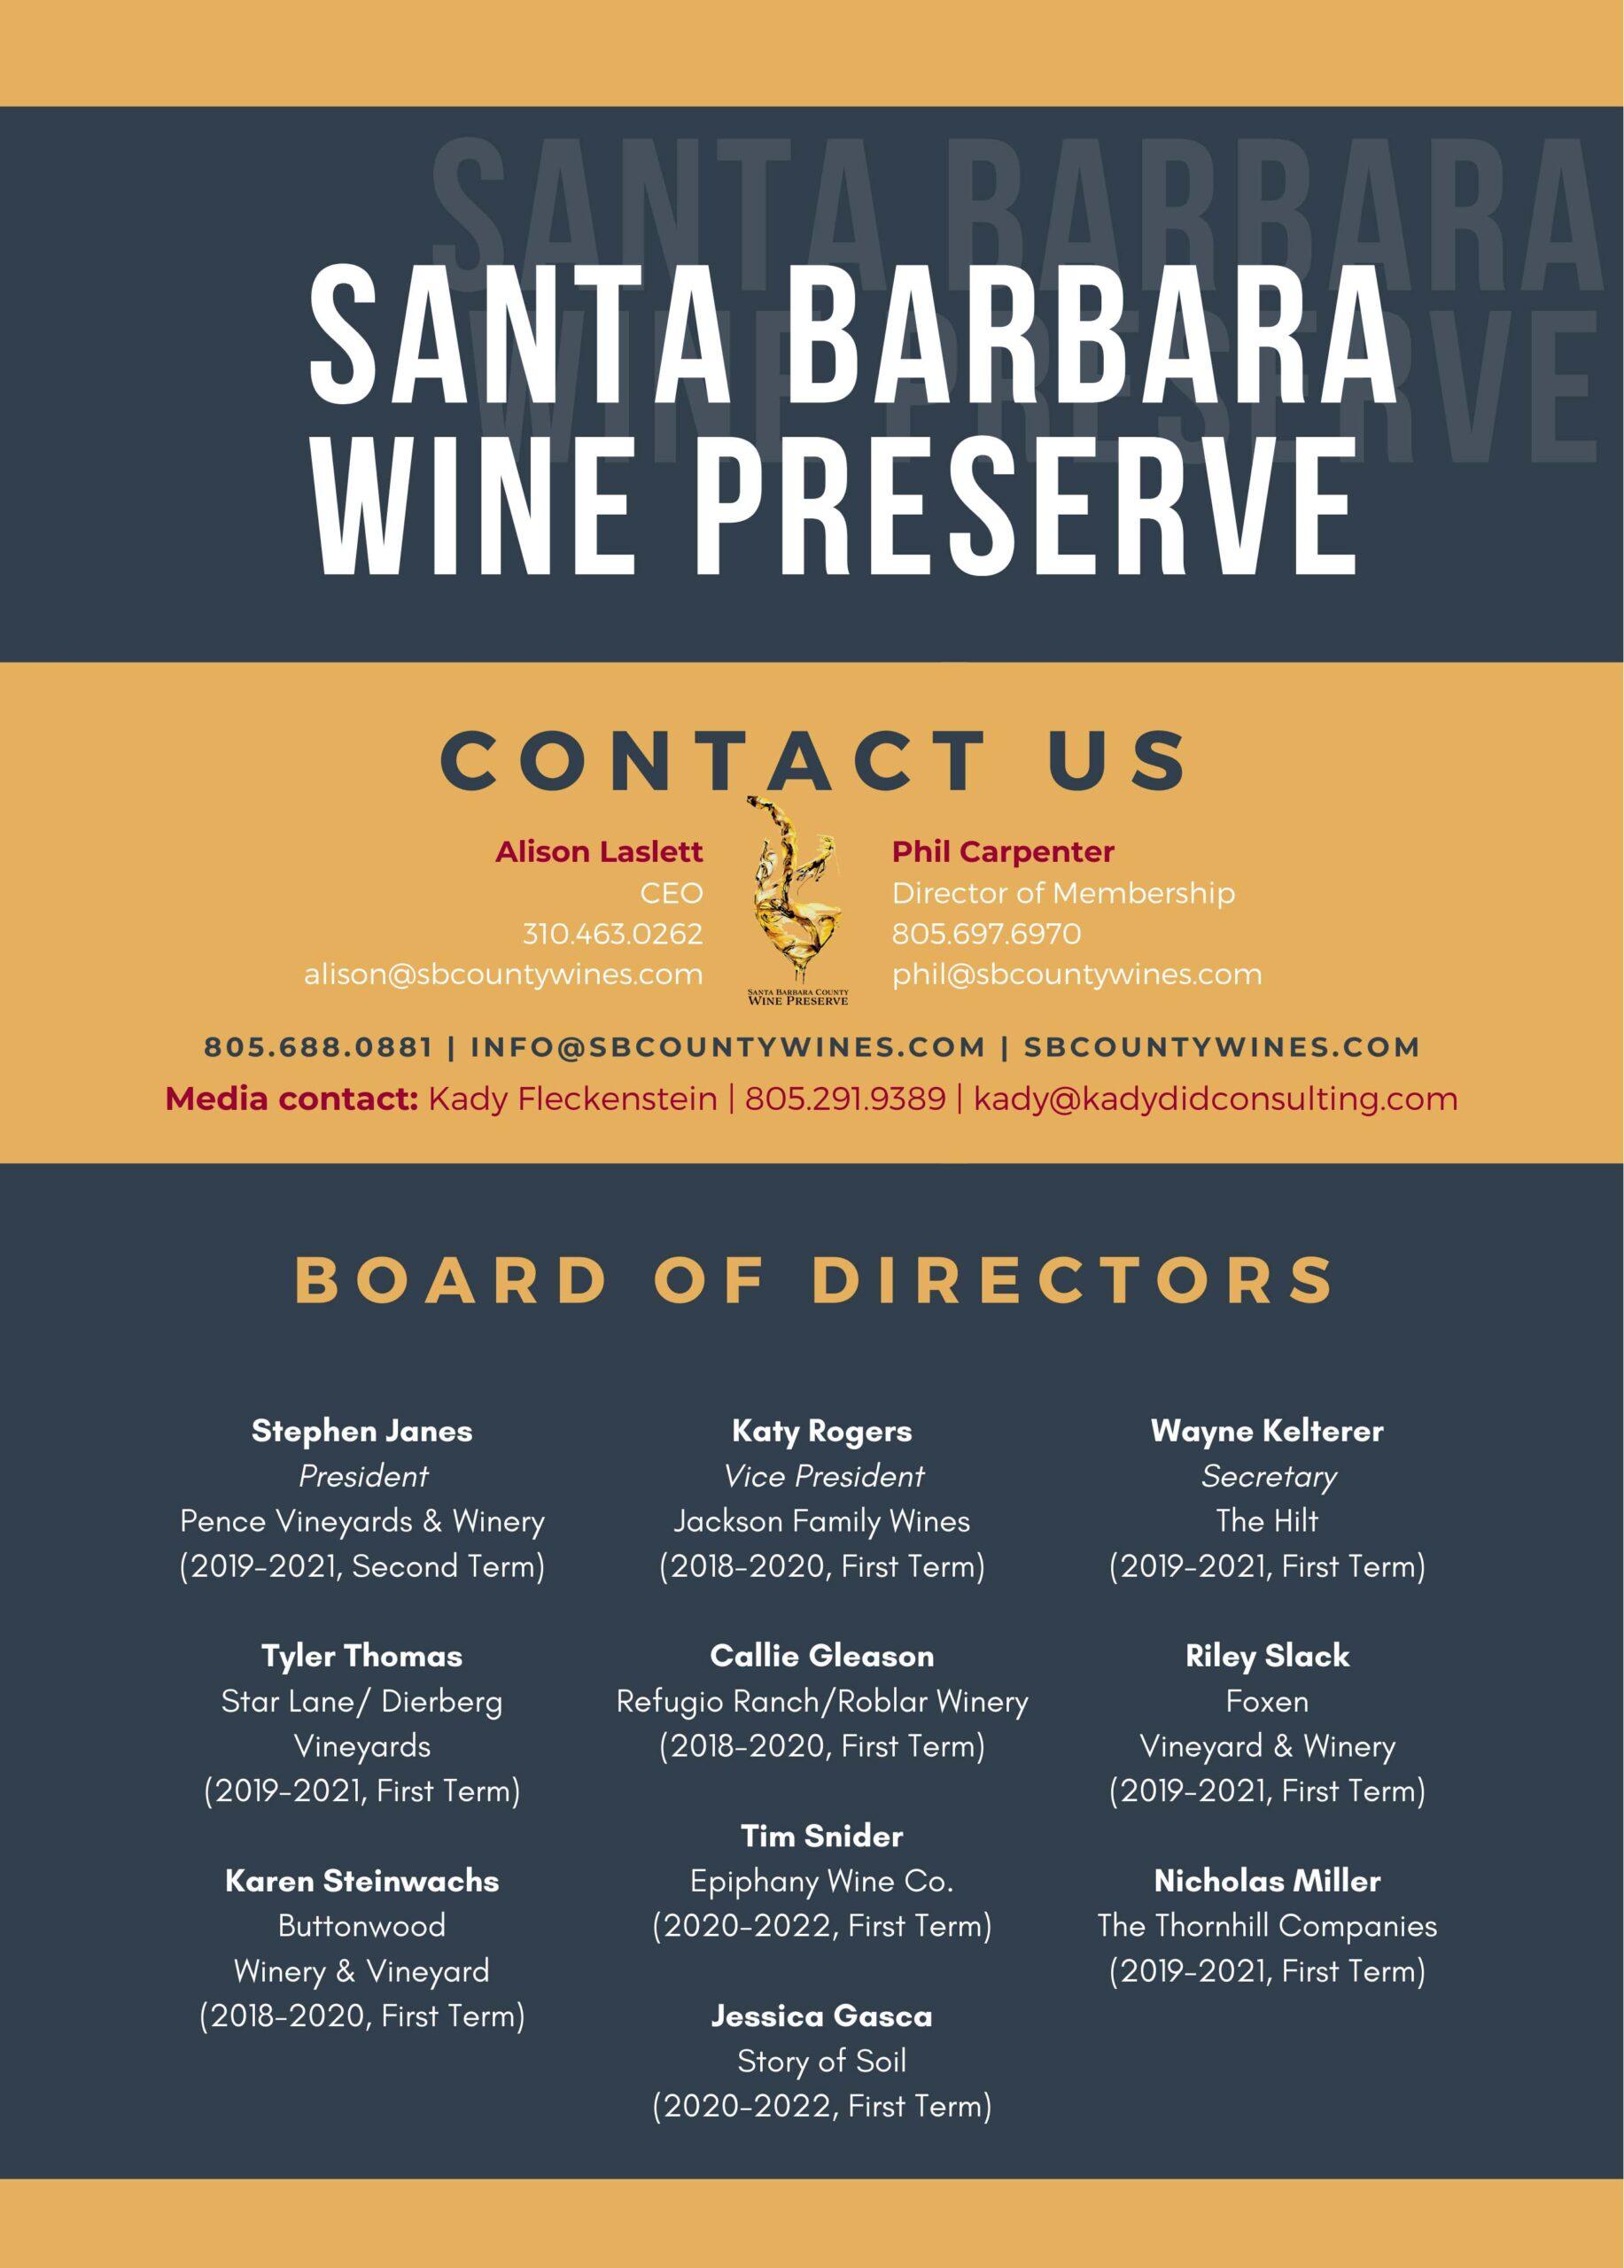 Santa Barbara Wine Preserve Contact